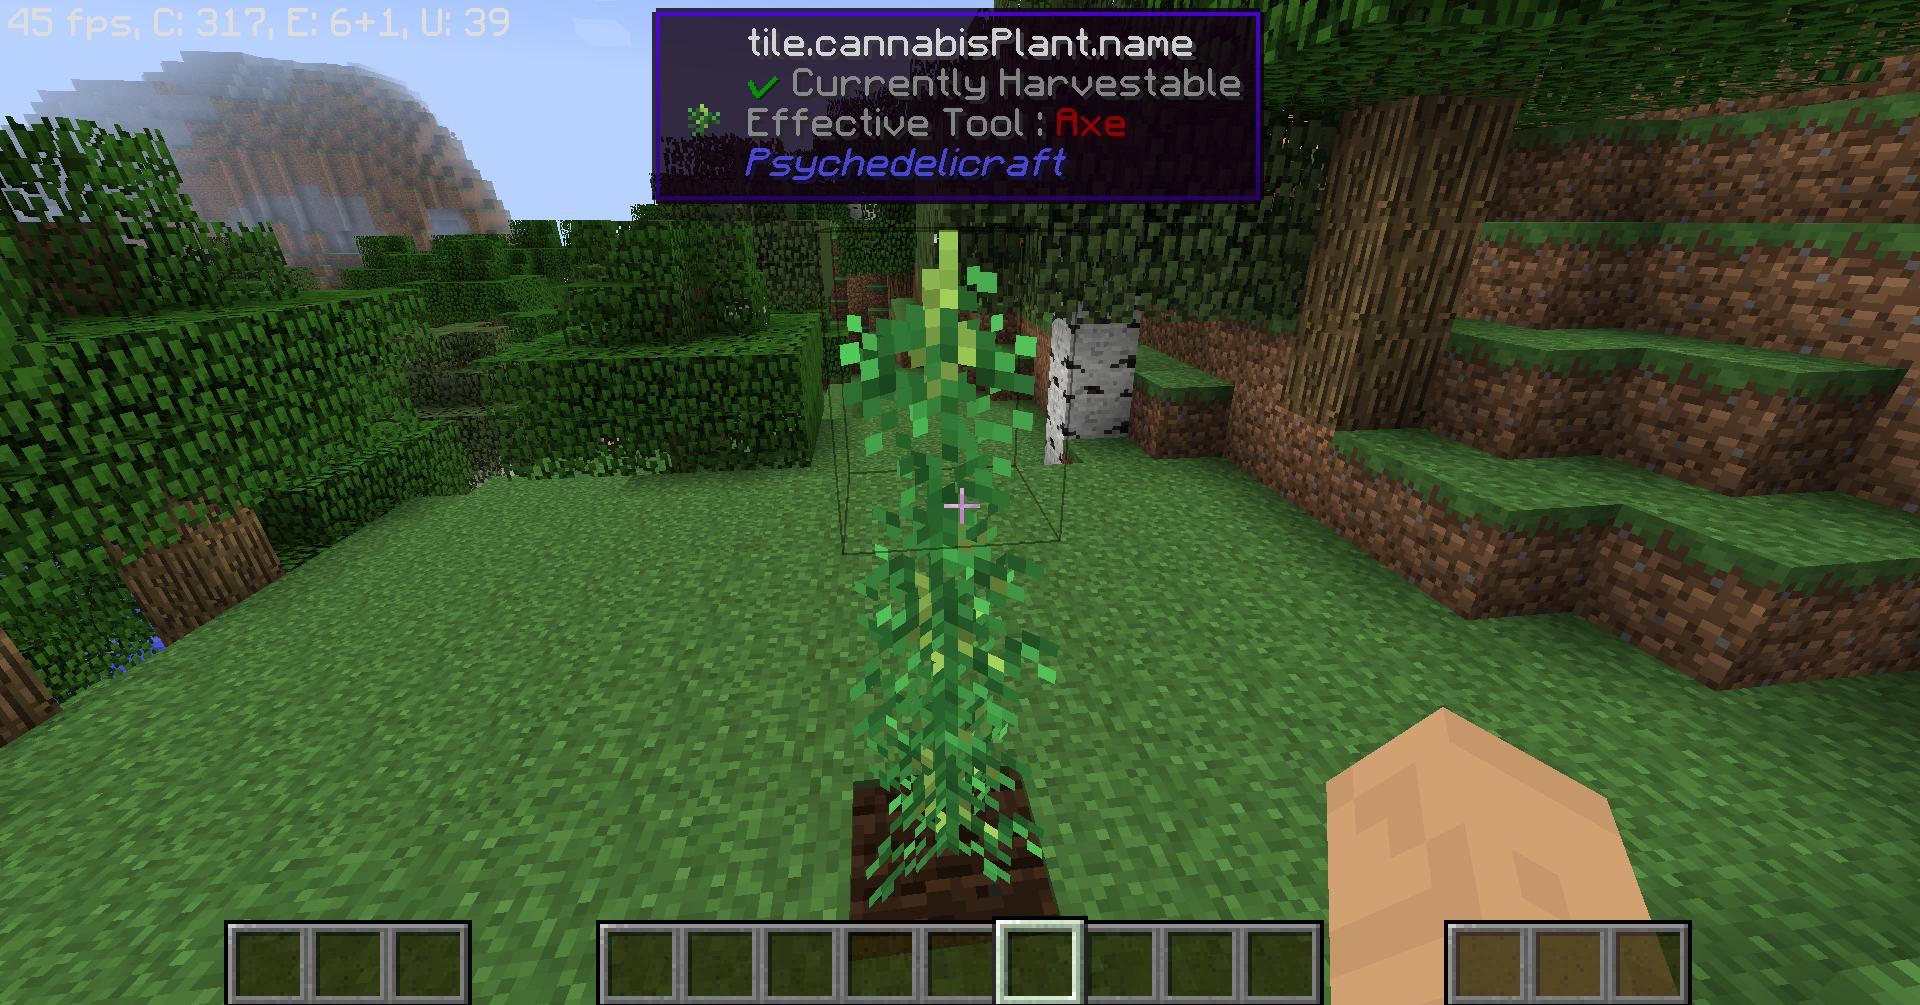 minecraft weed